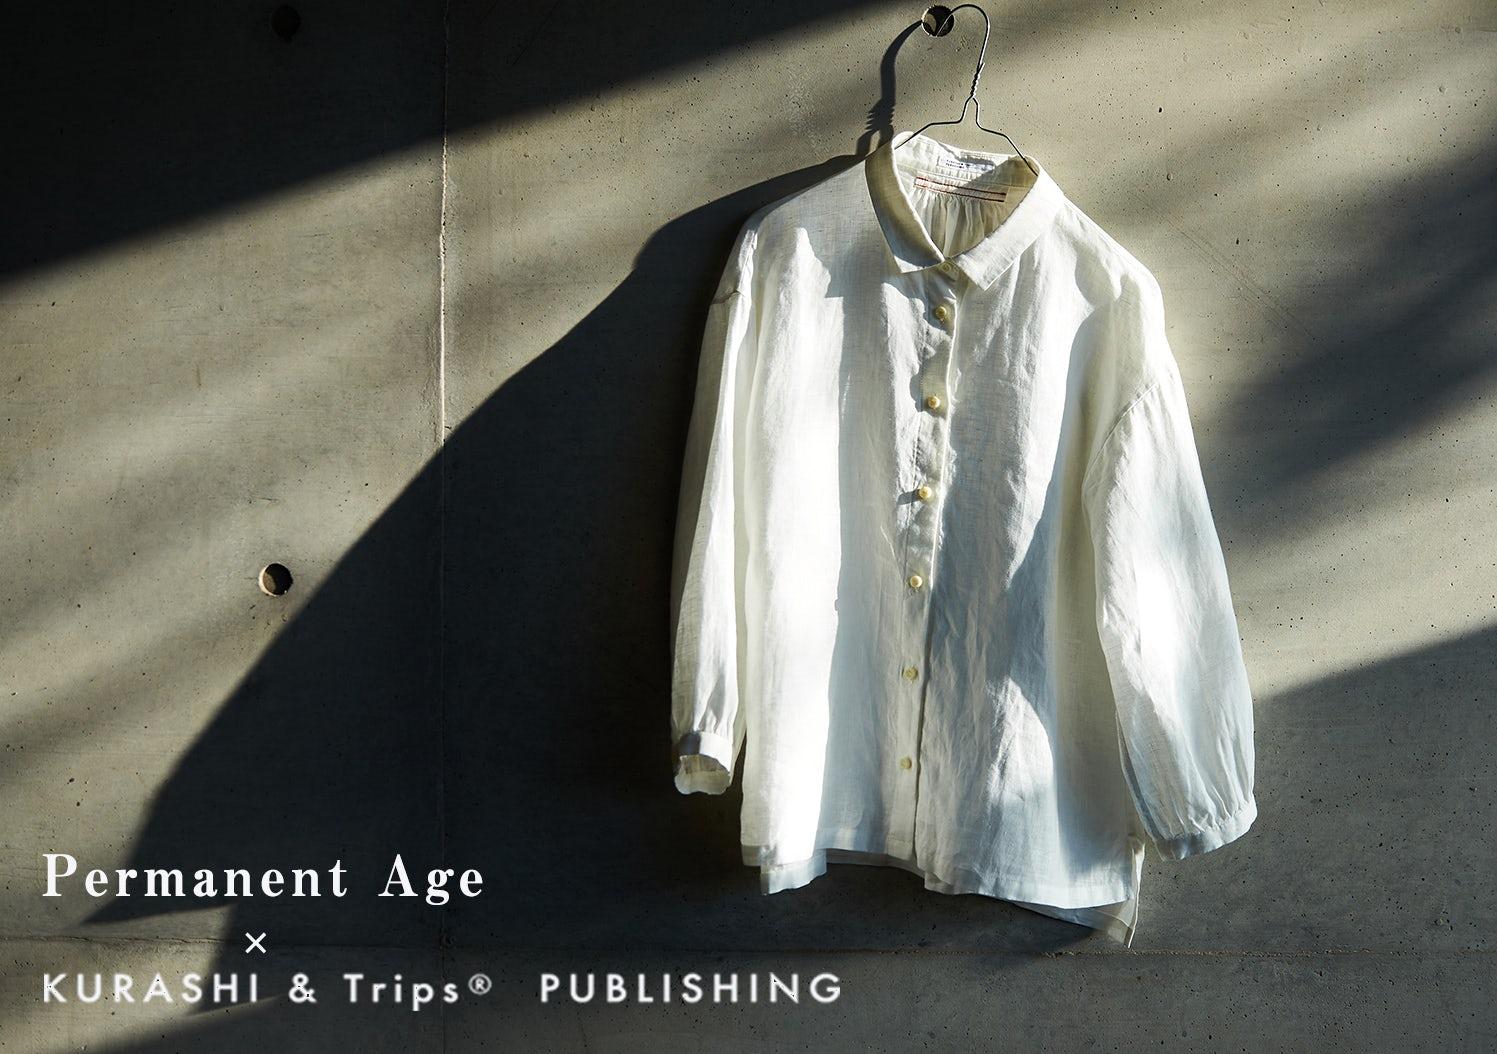 KURASHI&Trips PUBLISHING / Permanent Ageとつくった大人のリネンブラウスの画像